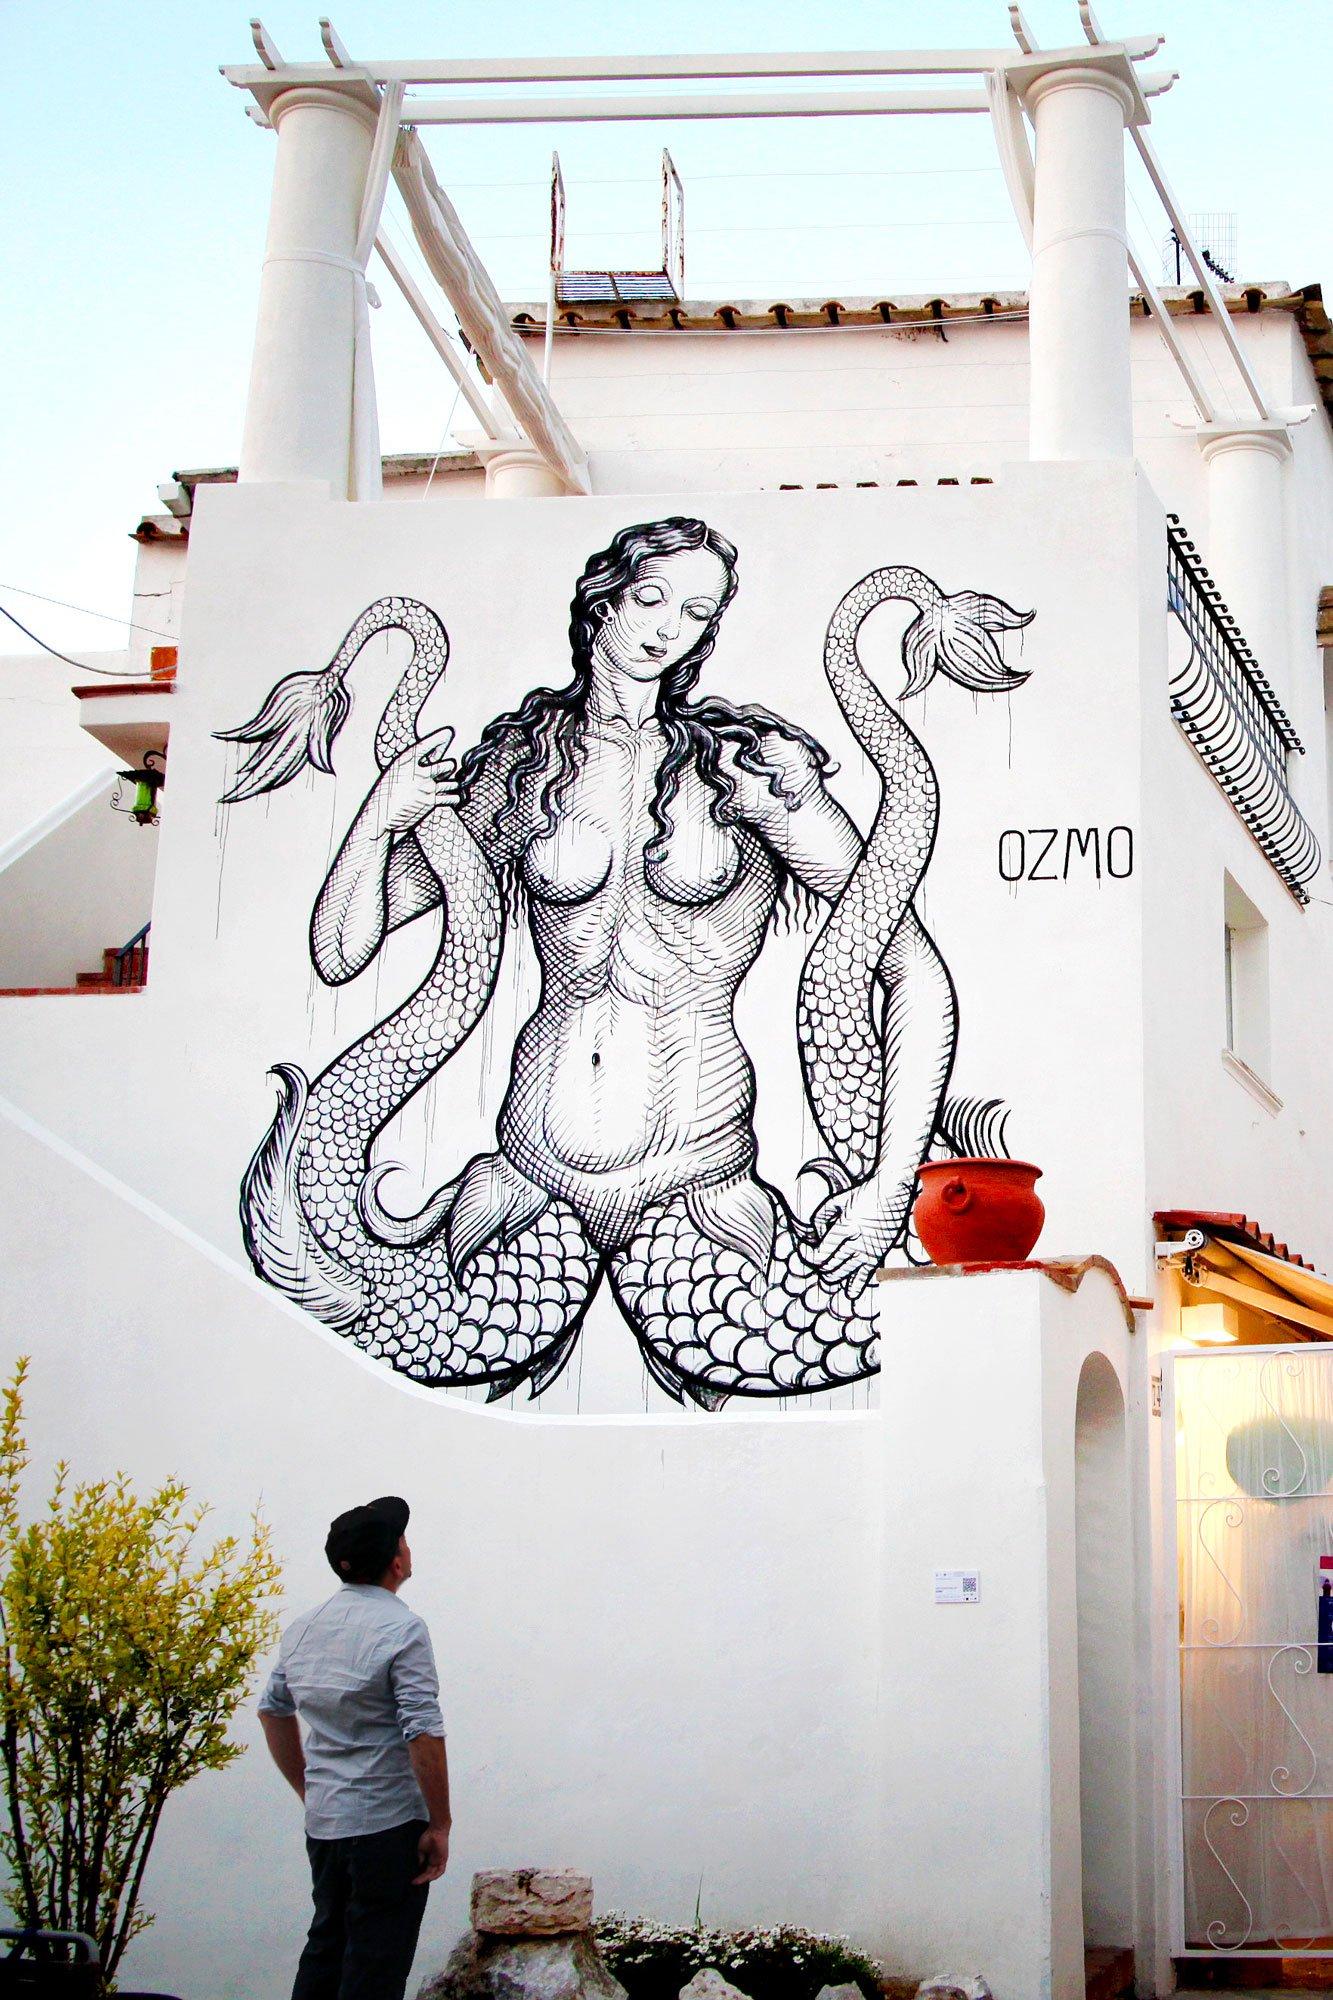 Syren in the Island of Capri